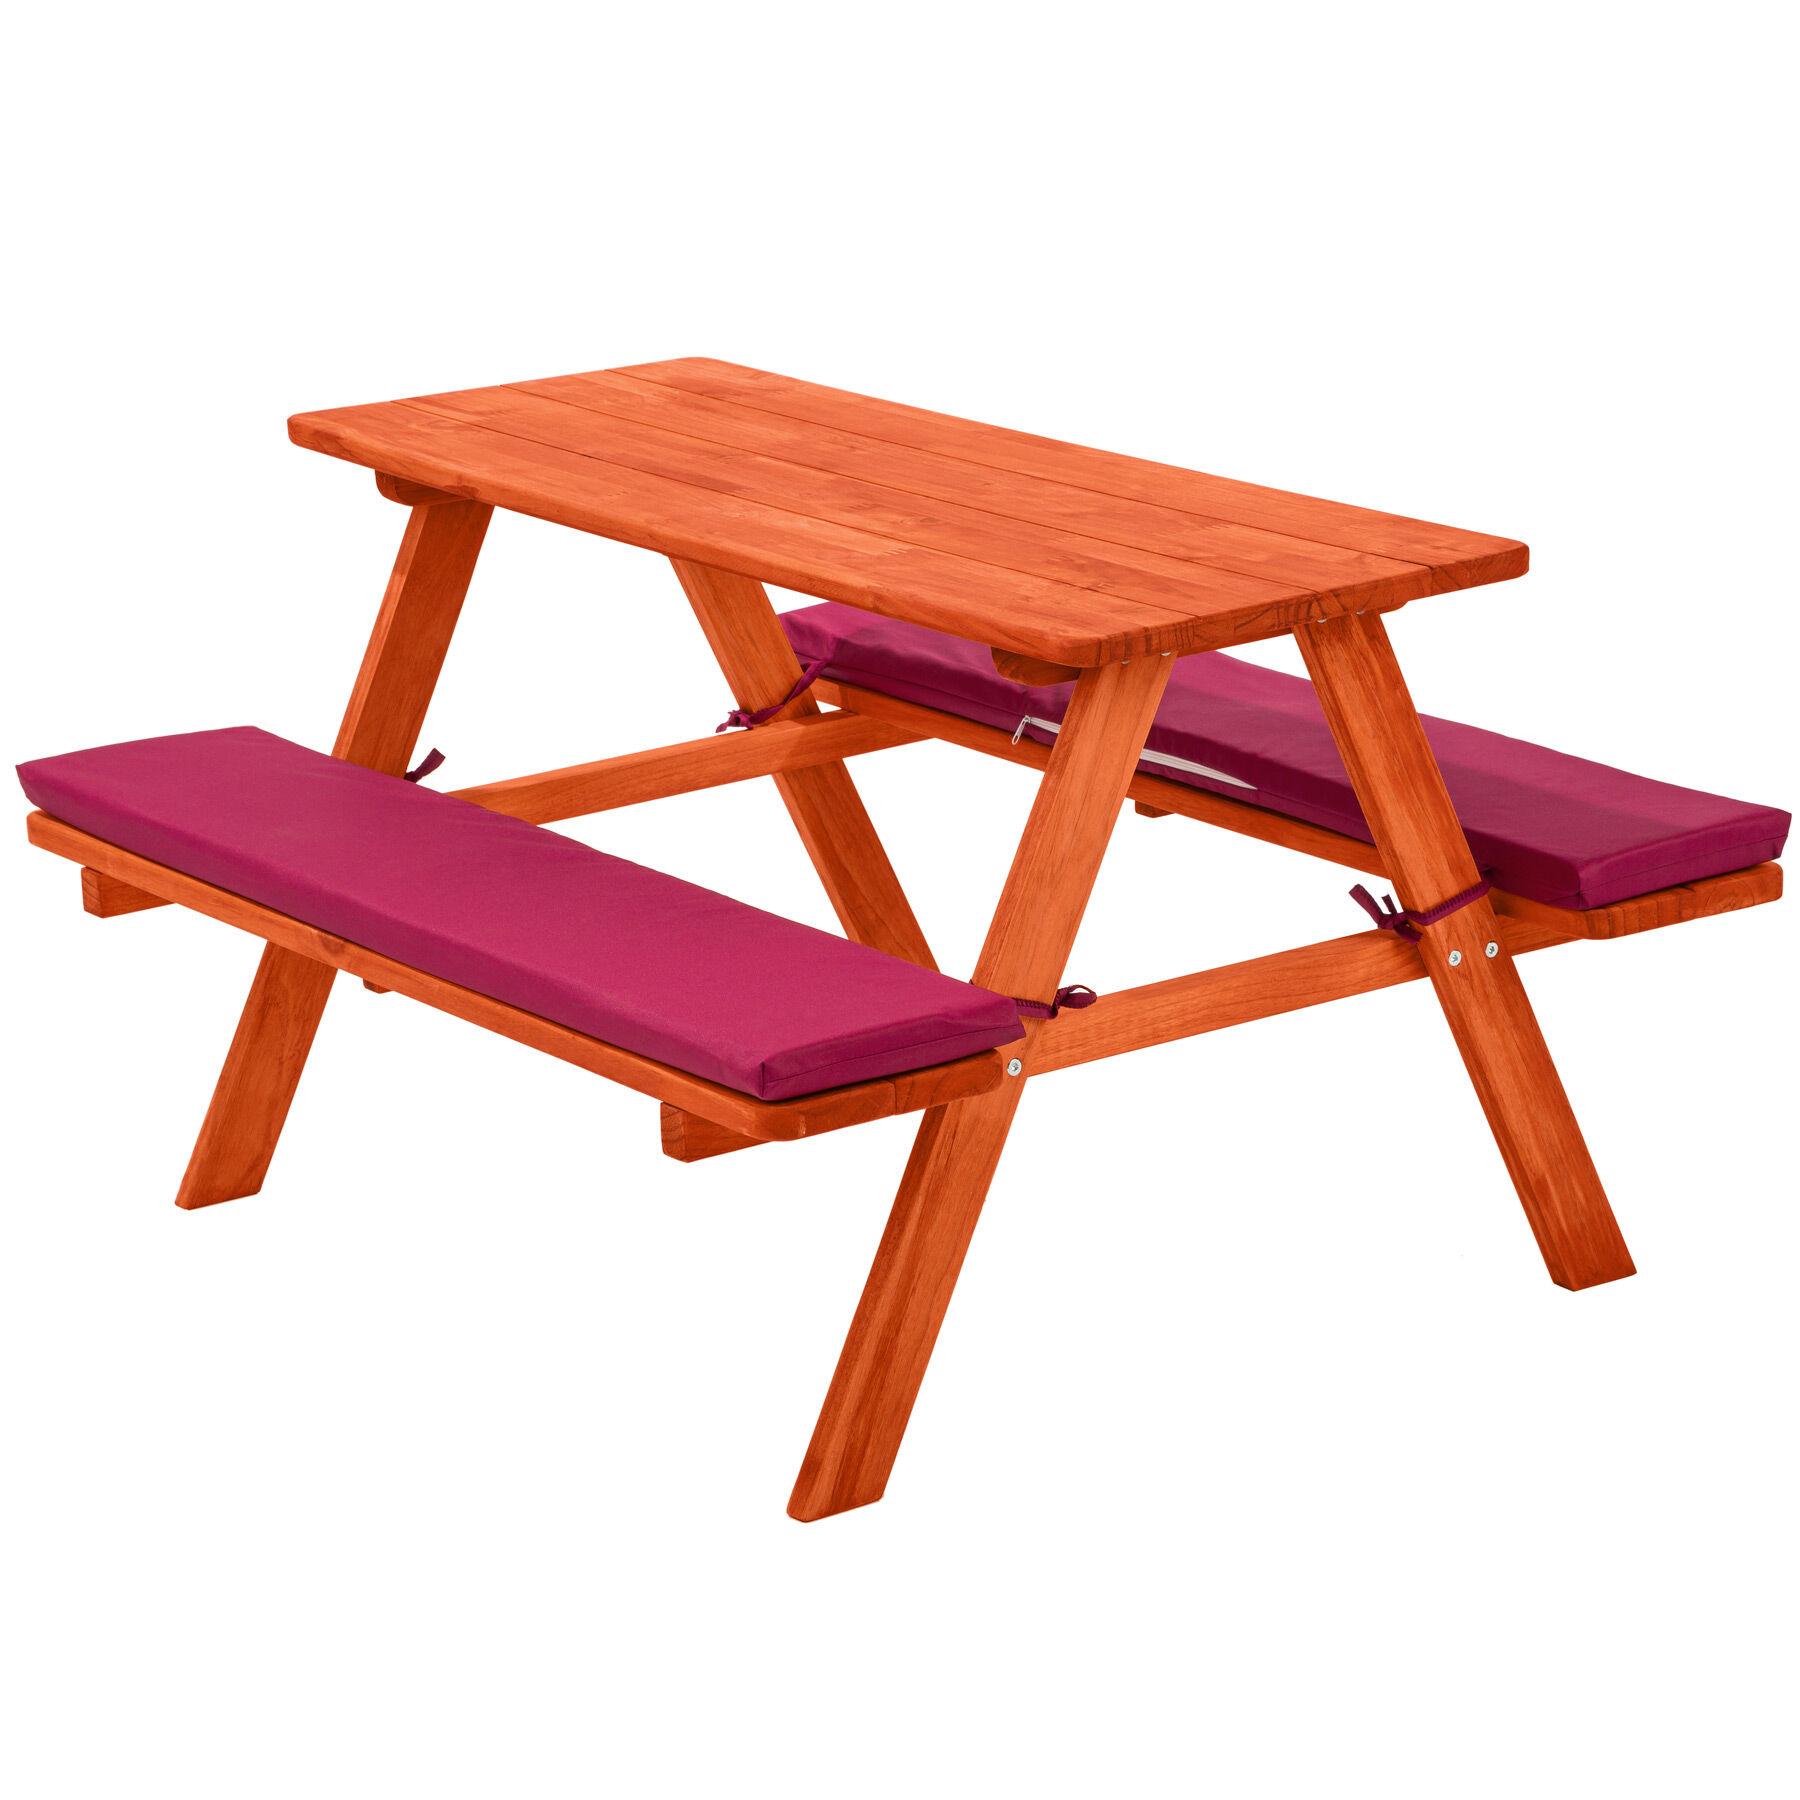 tectake Kids wooden picnic bench - red